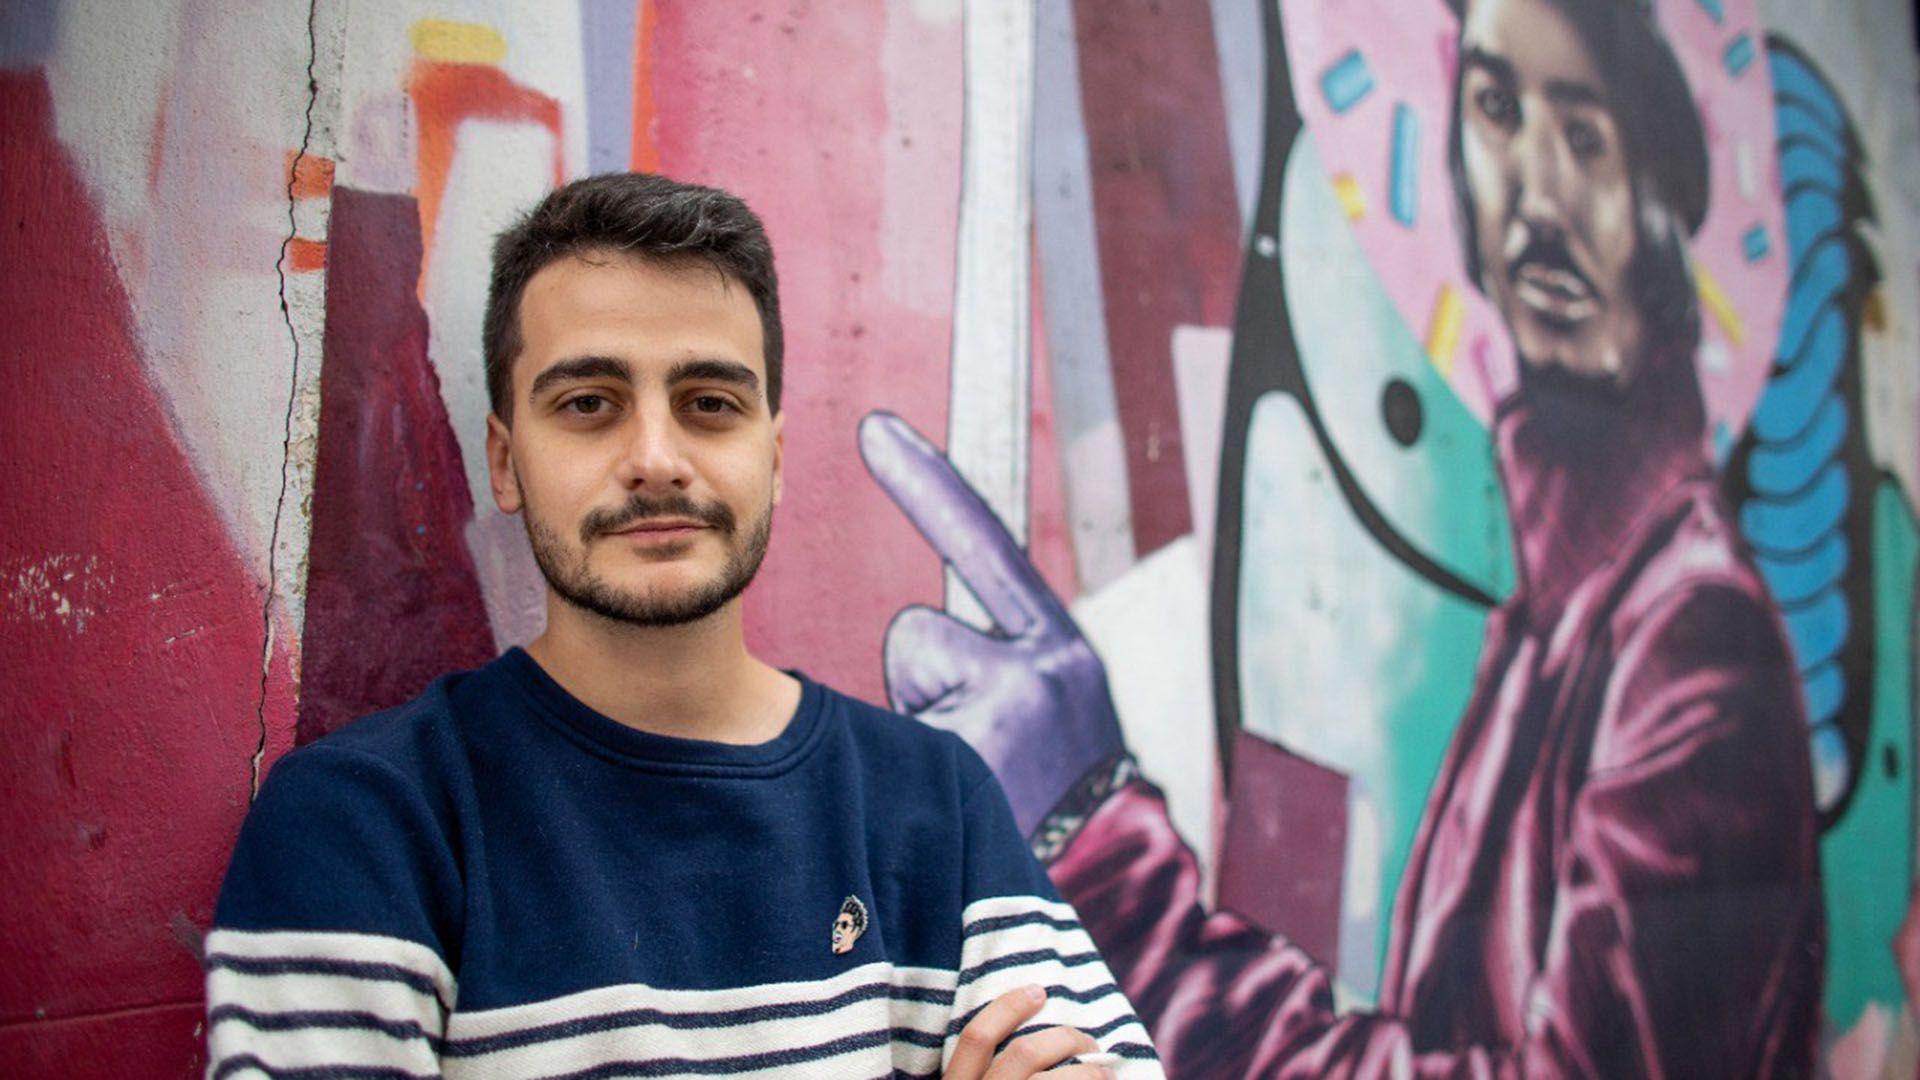 Damian Kuk